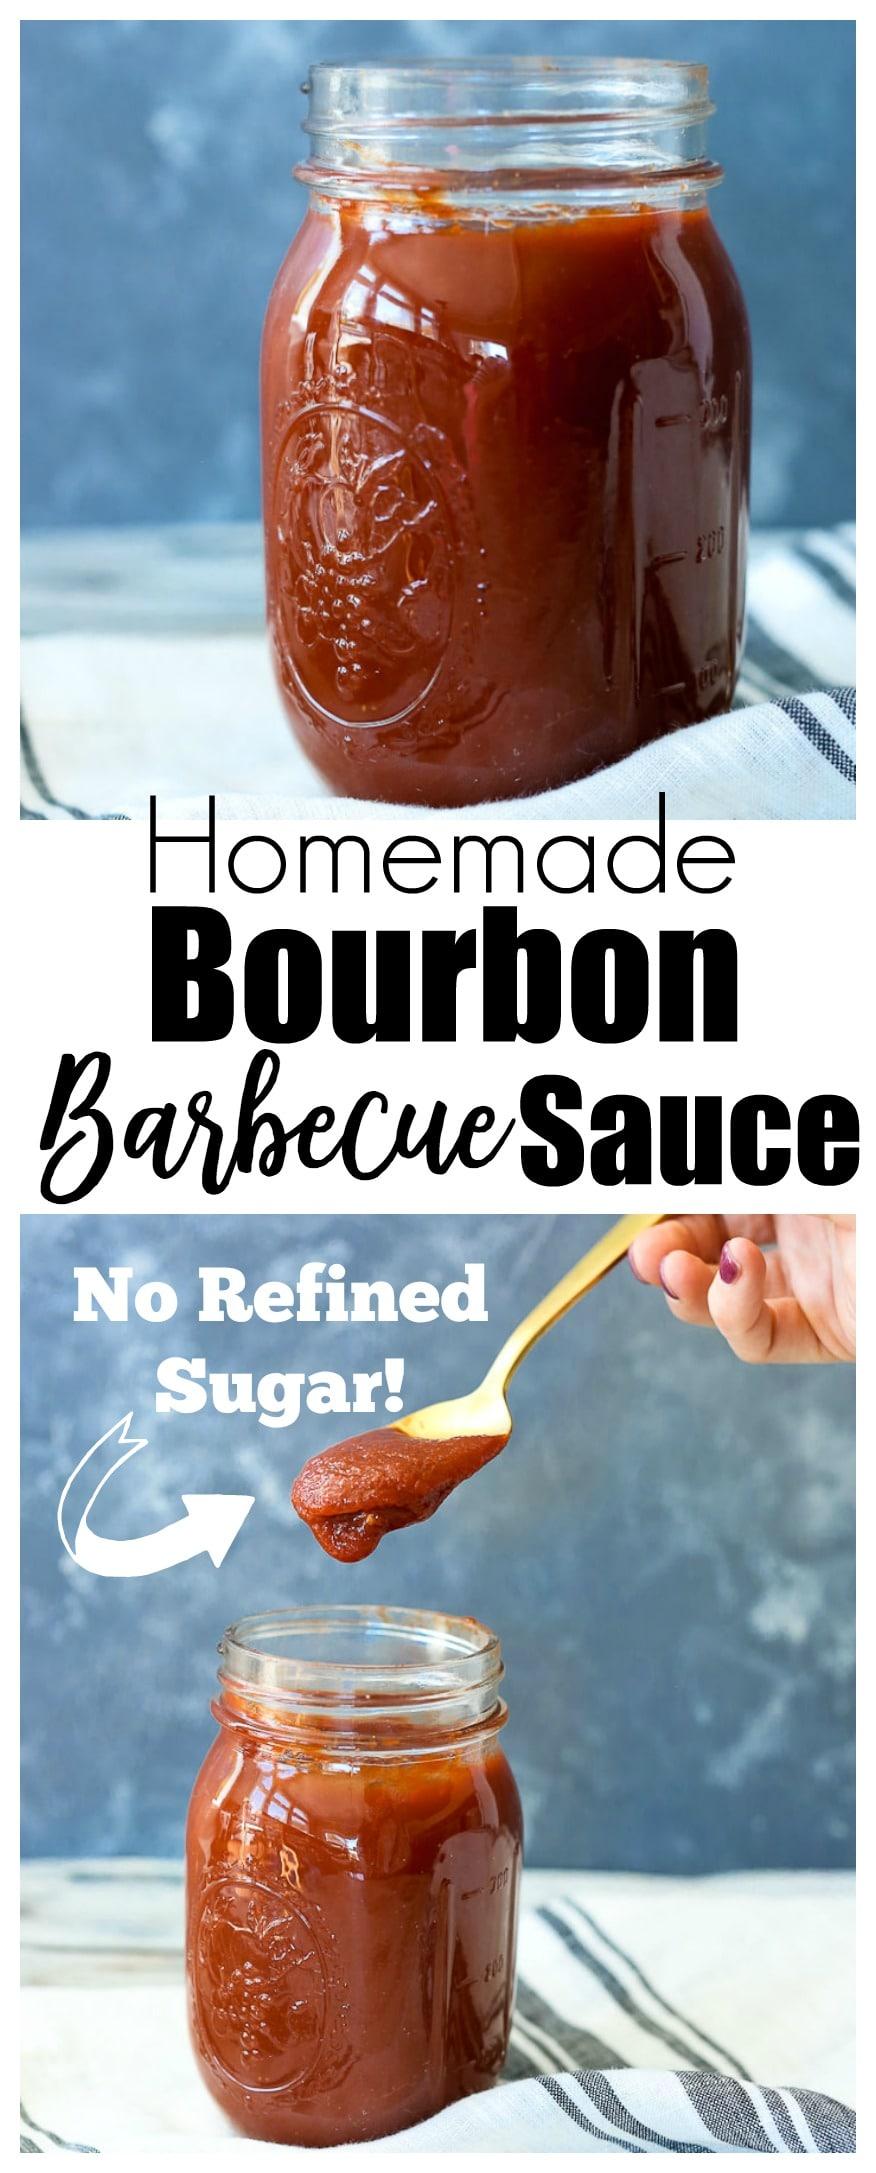 homemade healthier Bourbon Barbecue Sauce with no refined sugar.